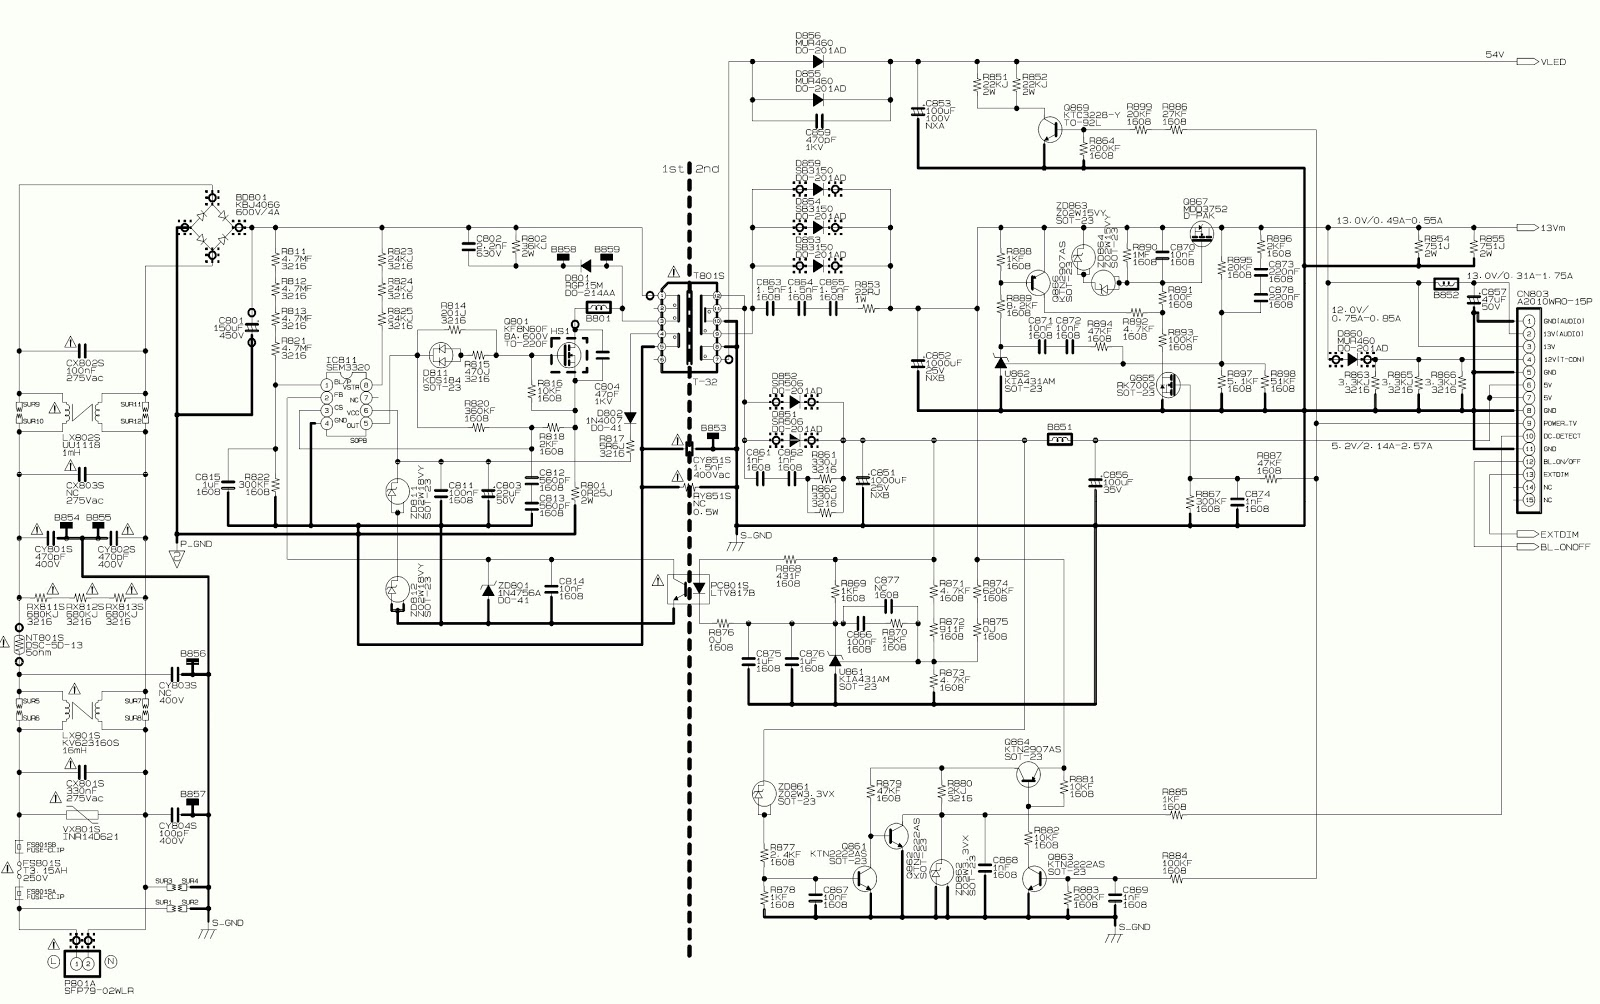 toshiba led tv schematic diagram 9 ajk rdb design de \u2022 Tohatsu Outboard Wiring Diagram toshiba 39l2300 toshiba 32l2300 smps circuit diagram schematic rh schematicscom blogspot com 32 inch toshiba tv schematic diagrams 32 inch toshiba tv